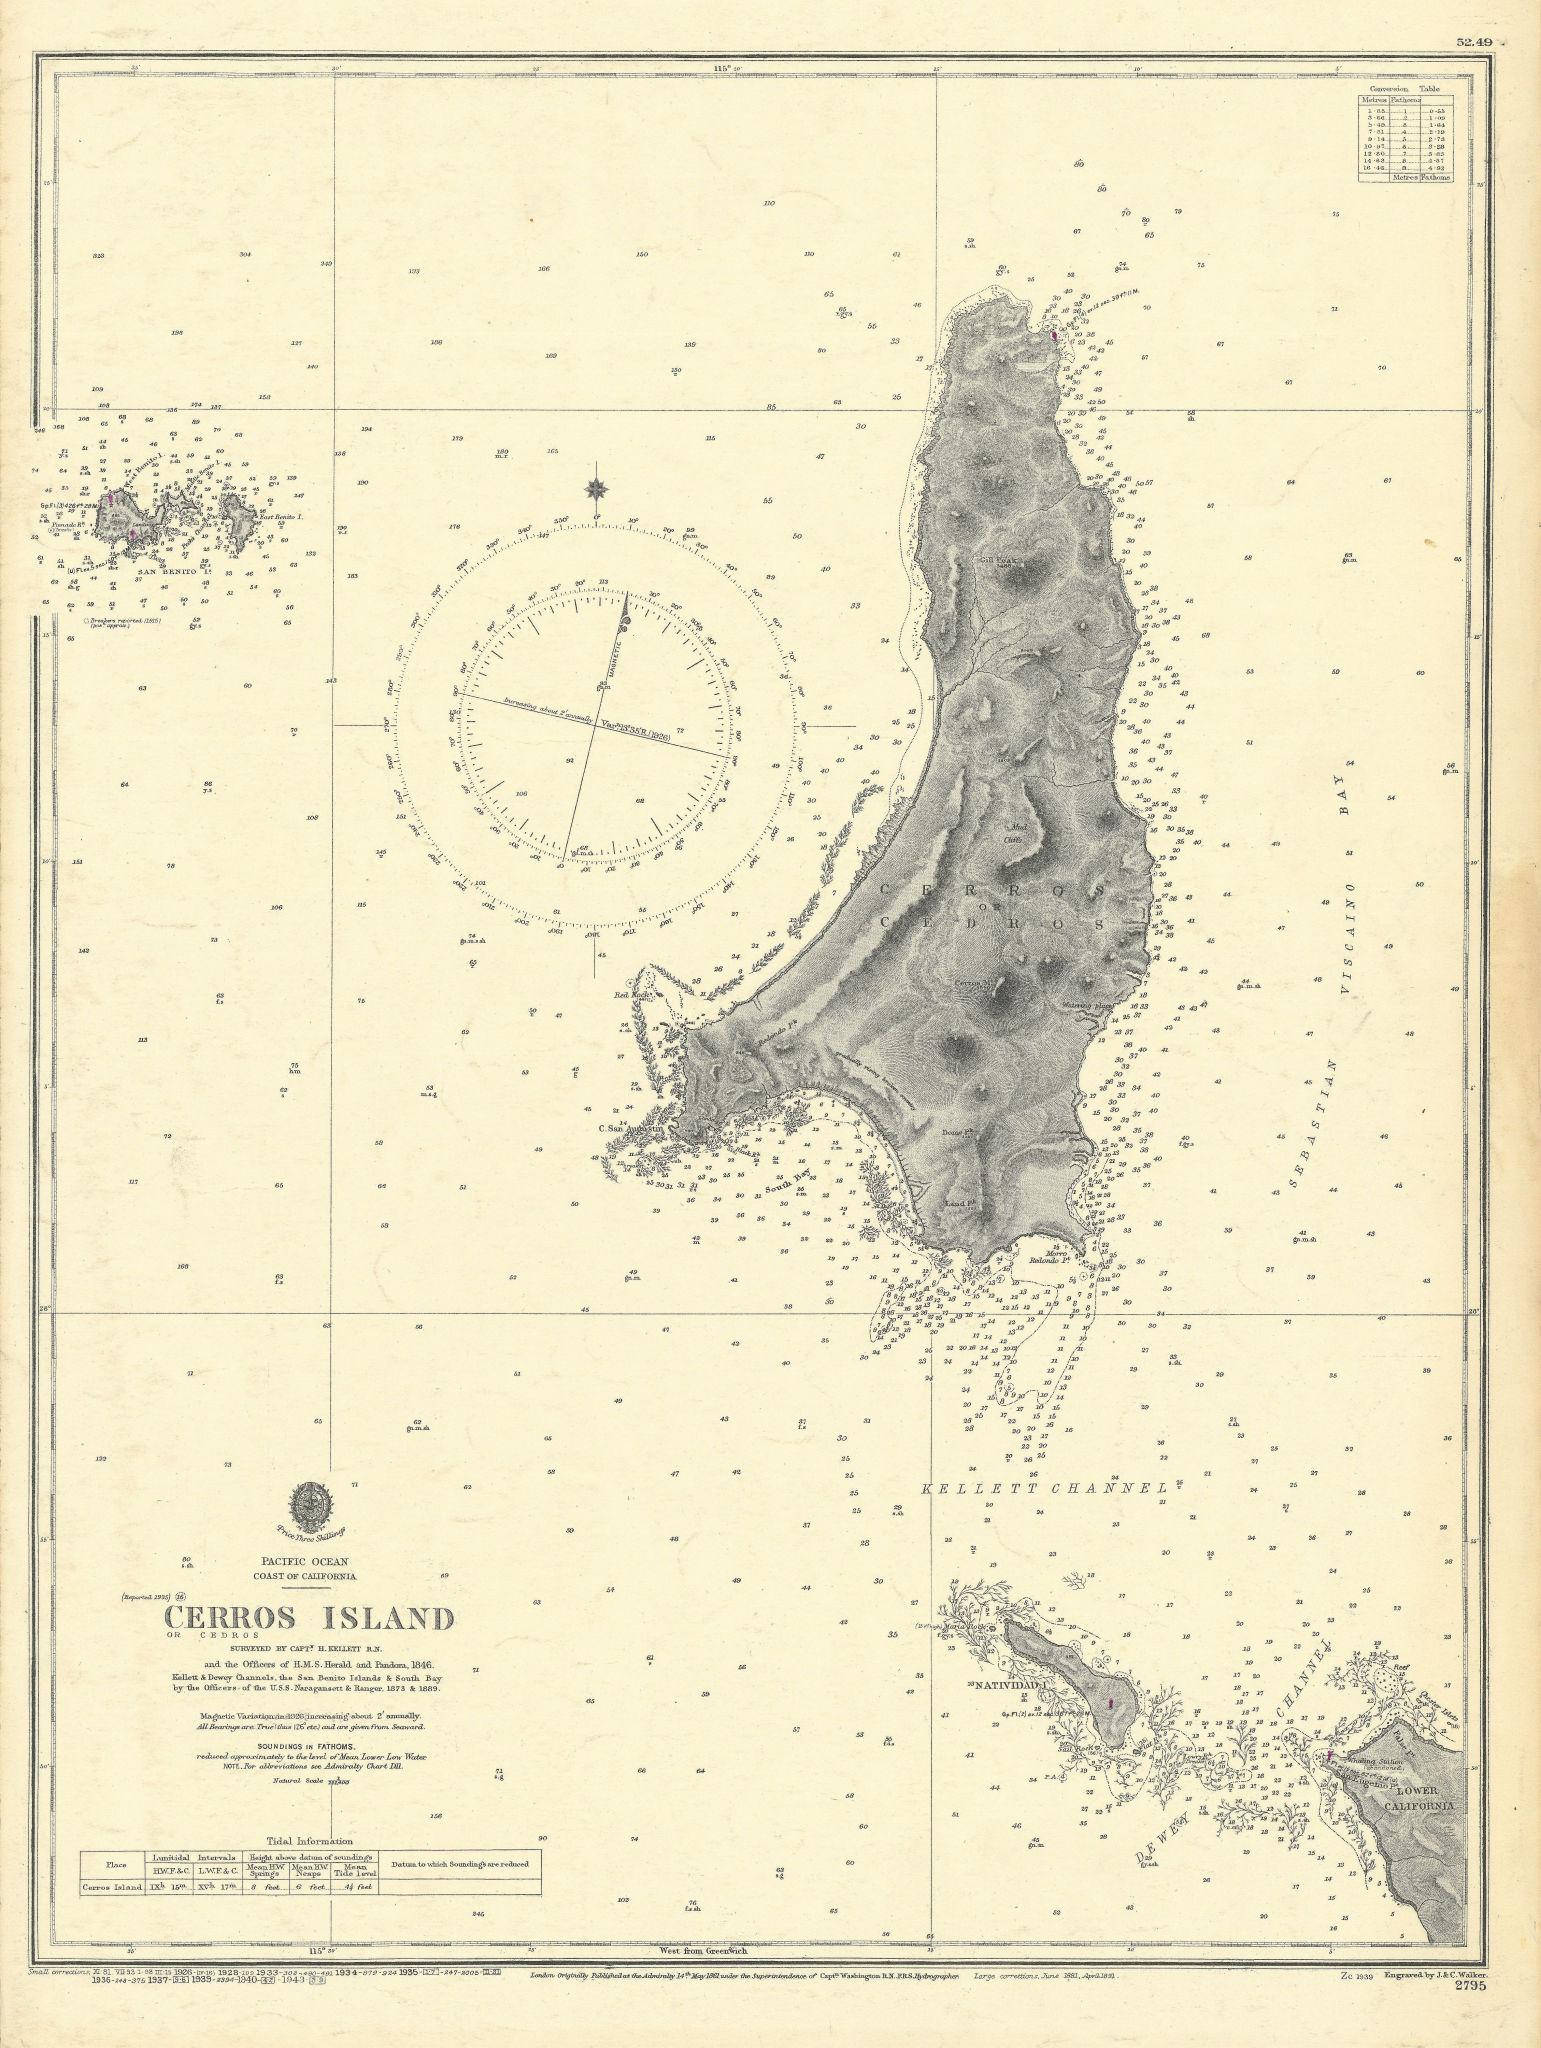 Cerros Island Isla Cedros Baja California Mexico ADMIRALTY chart 1861 (1943) map